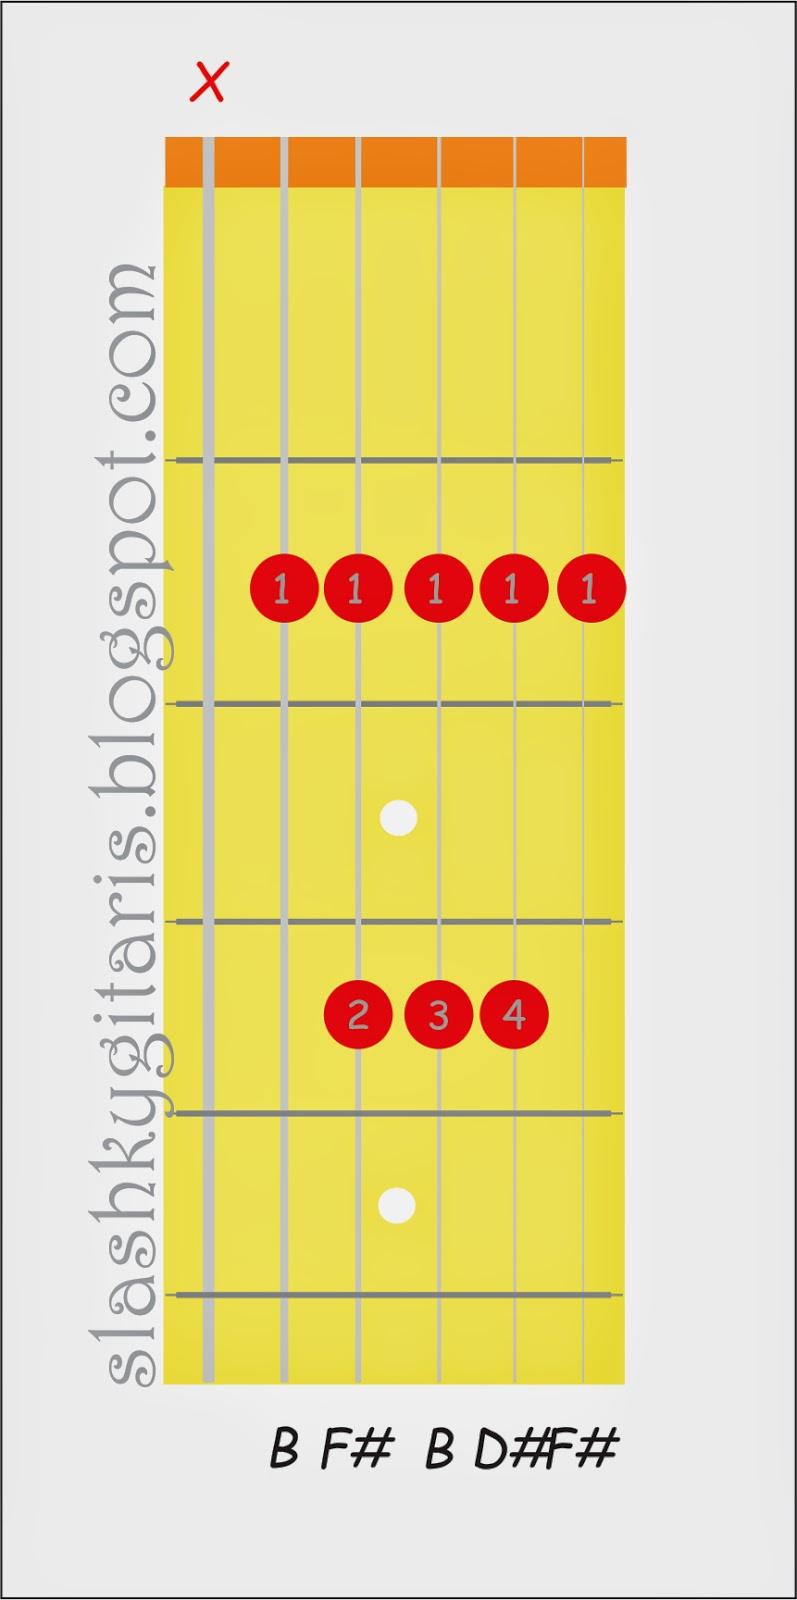 kunci gitar, chord gitar, kunci gitar peterpan, kunci gitar ungu, kunci gitar last child, kunci dasar gitar, cord gitar, gitar akustik, cara bermain gitar, kunci gitar armada, kord gitar, belajar gitar, kunci A mayor